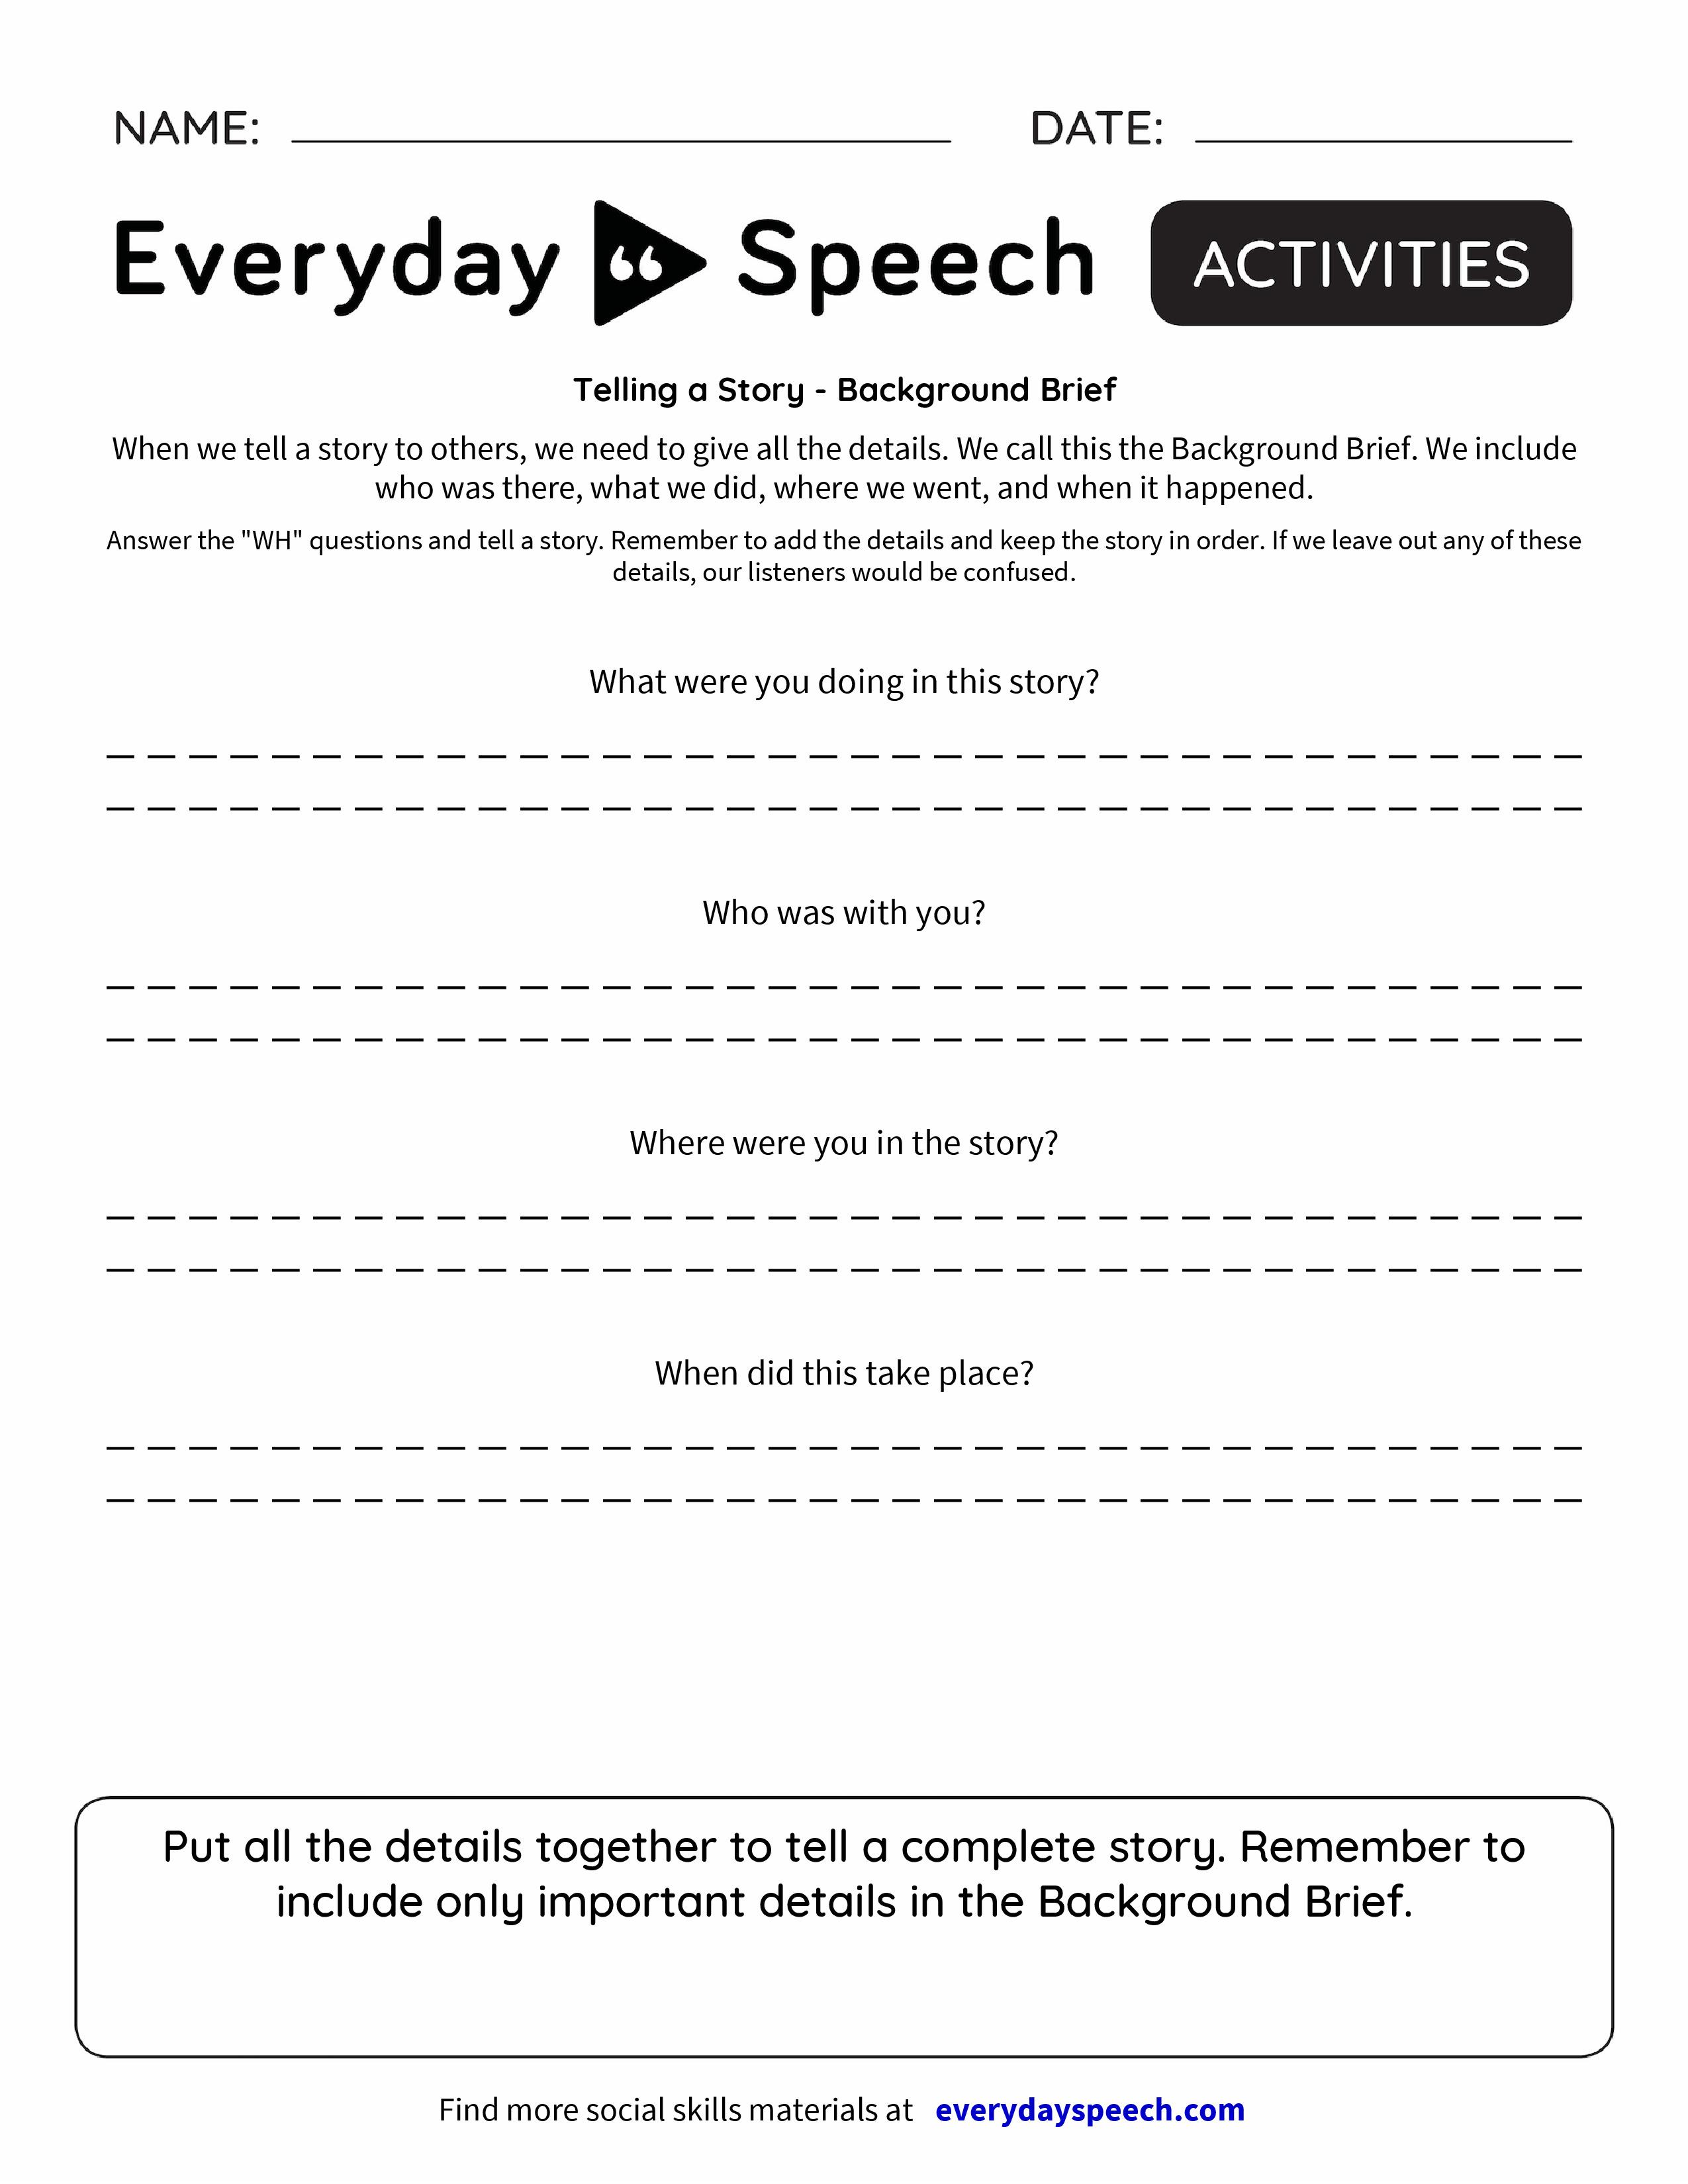 Telling a Story - Background Brief - Everyday Speech - Everyday Speech